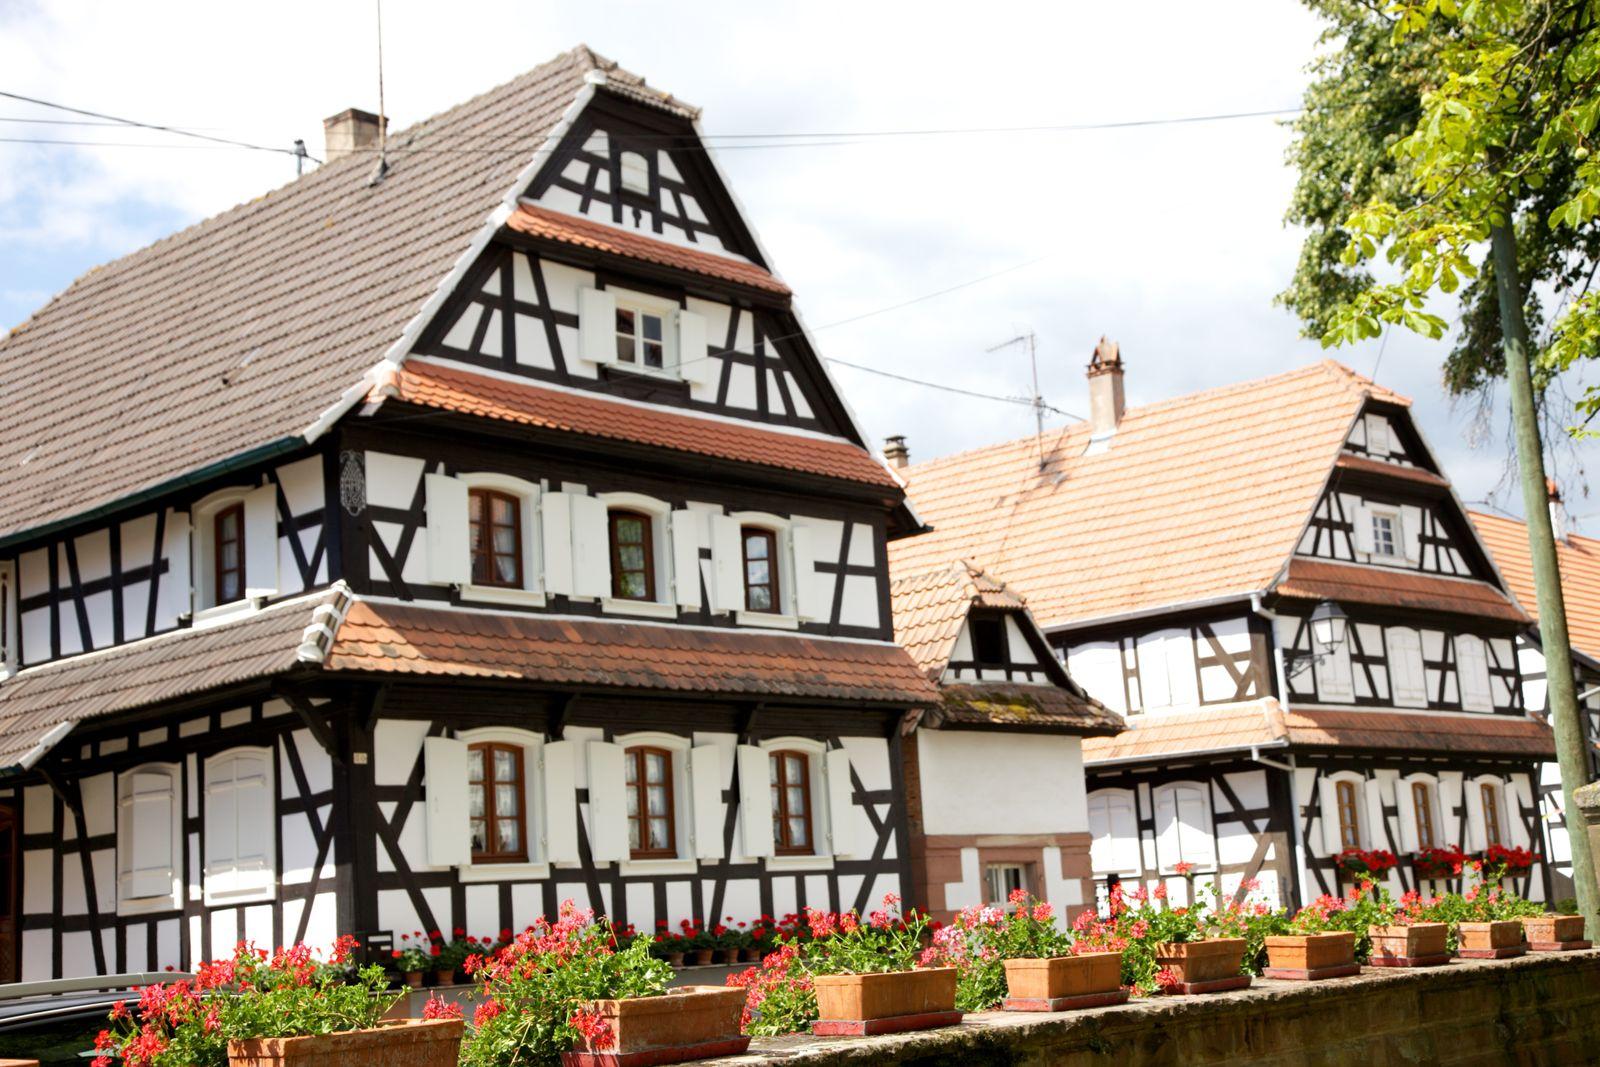 Le village de Hunspach - Rue principale